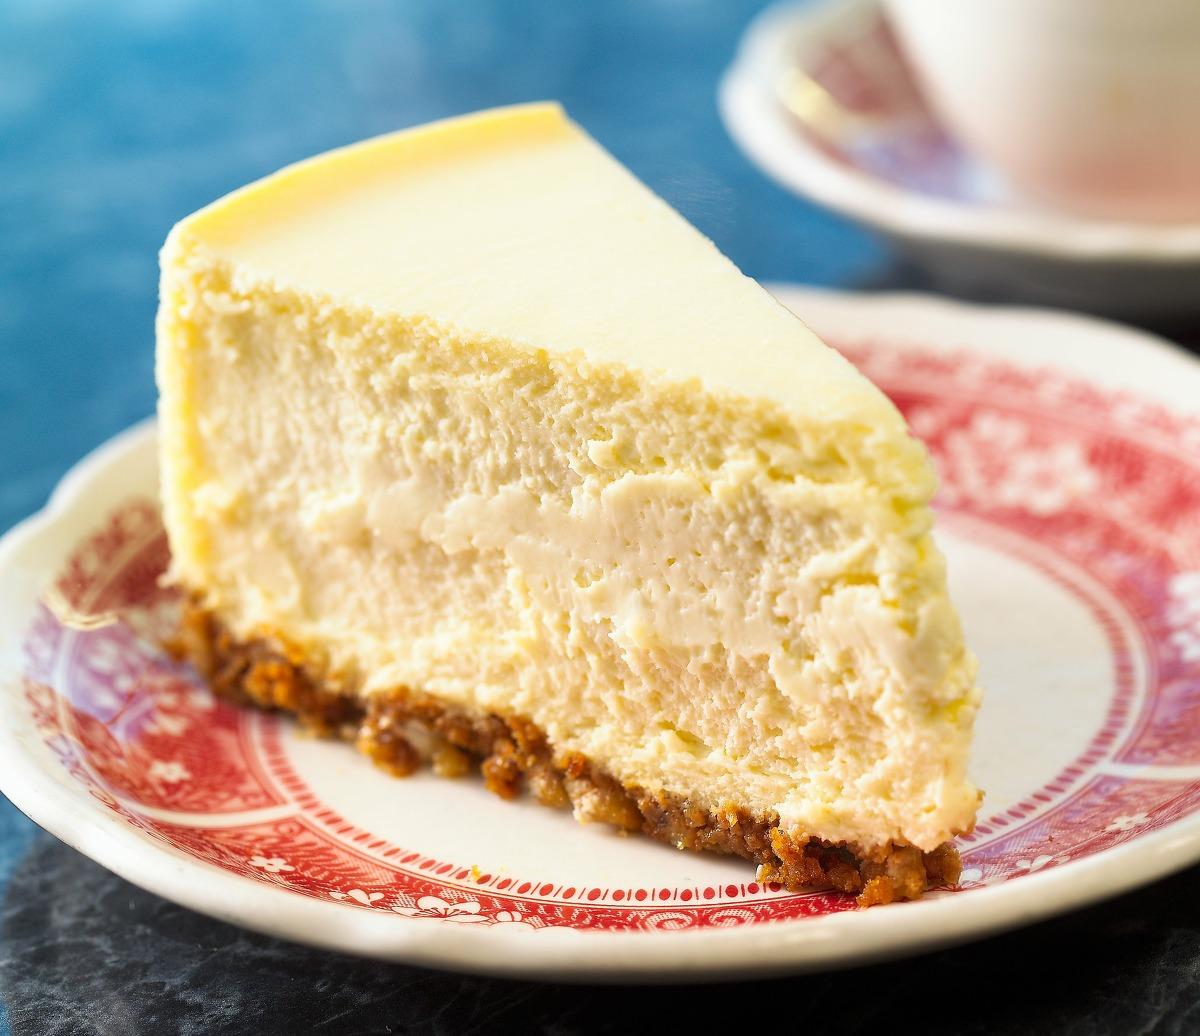 Cheesecake States: Maryland, West Virgnia Source: CashNetUsa